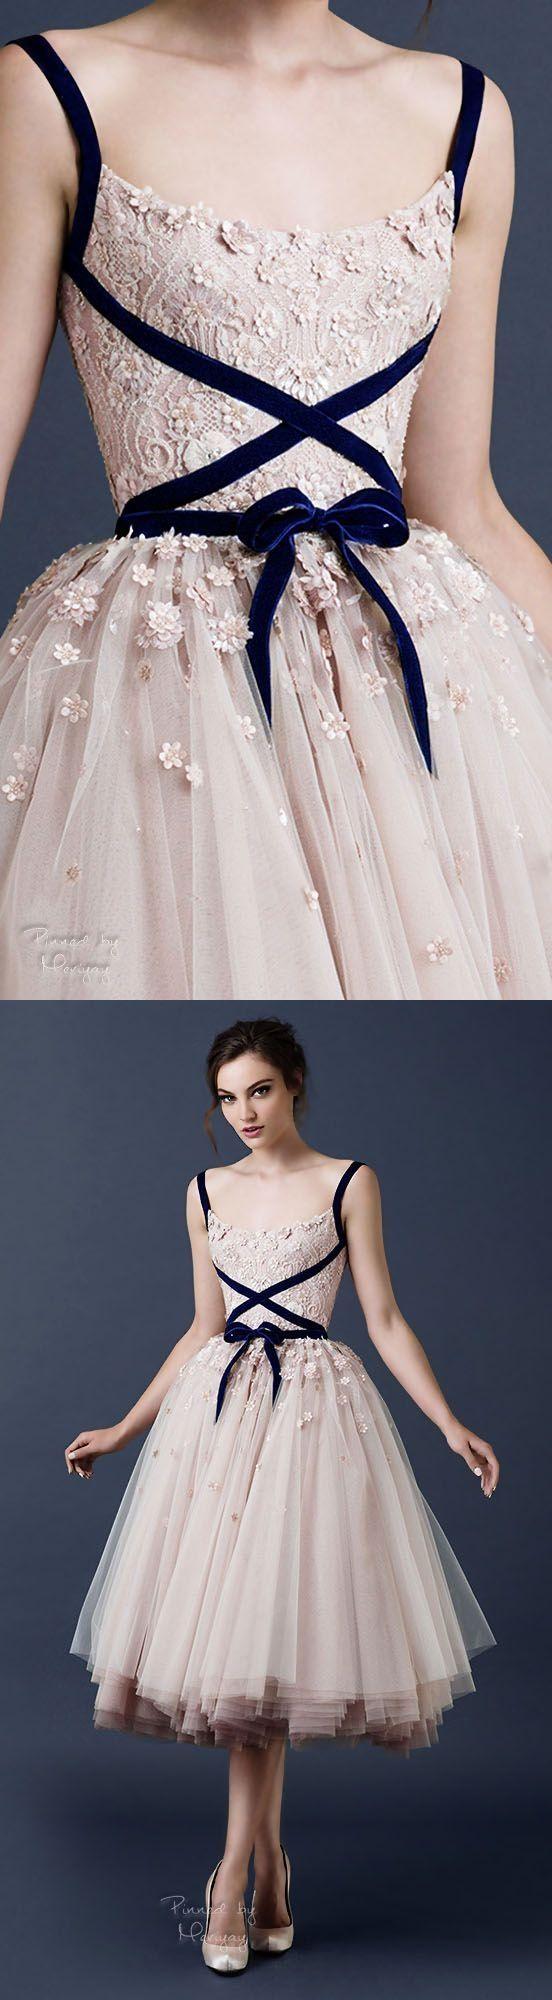 robe-demoiselle-d'honneur-courte